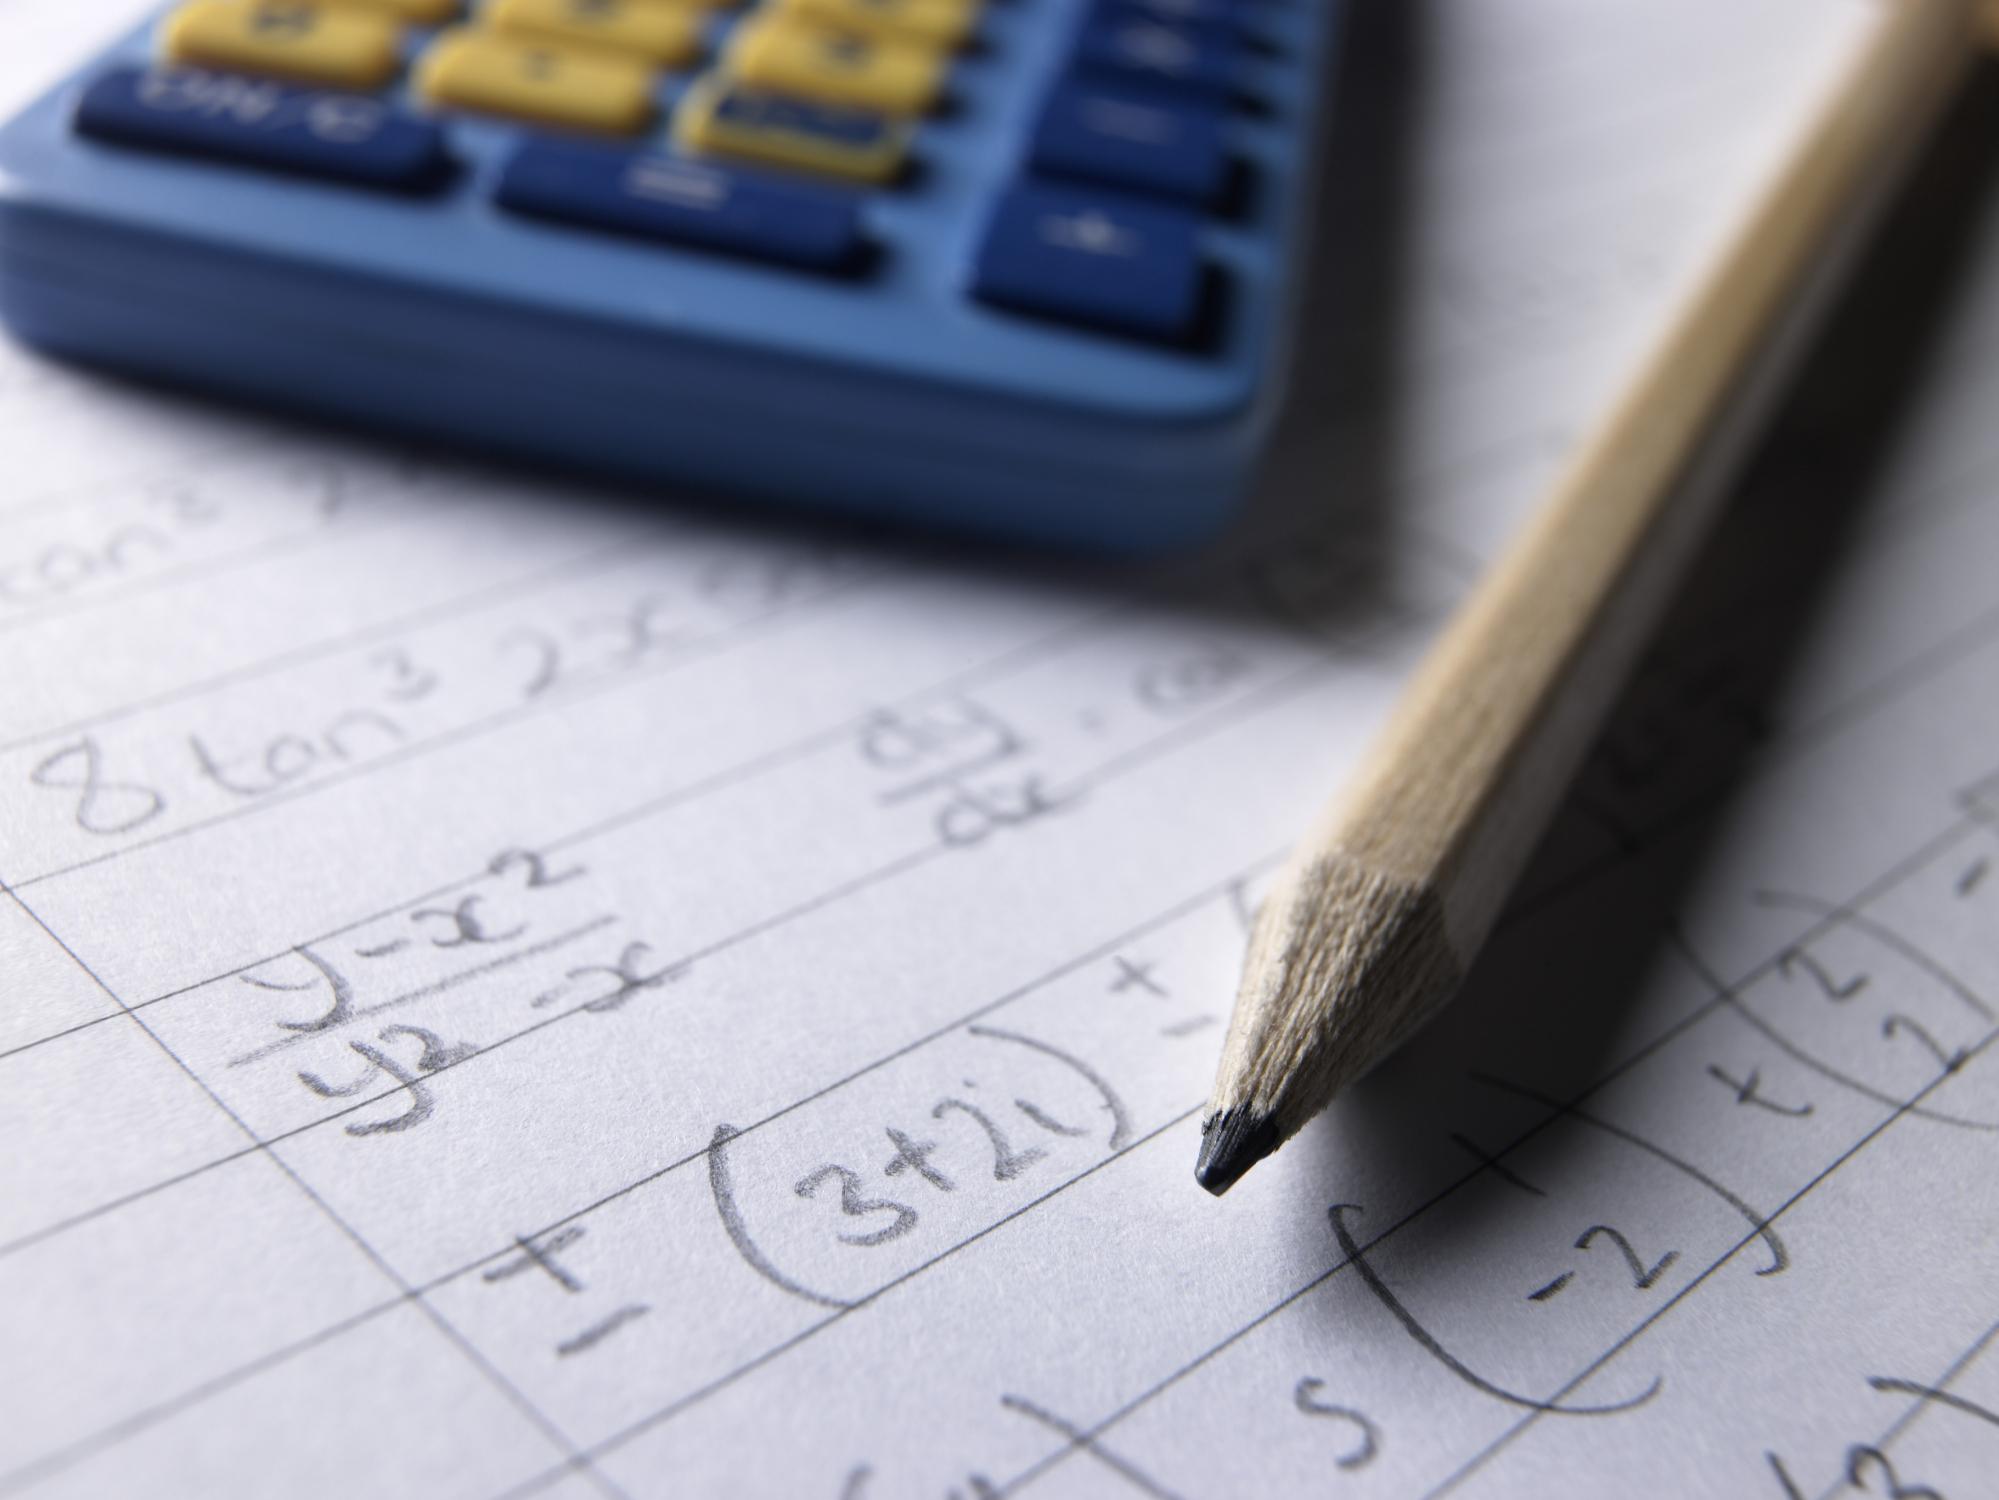 How to Calculate Percent Relative Range